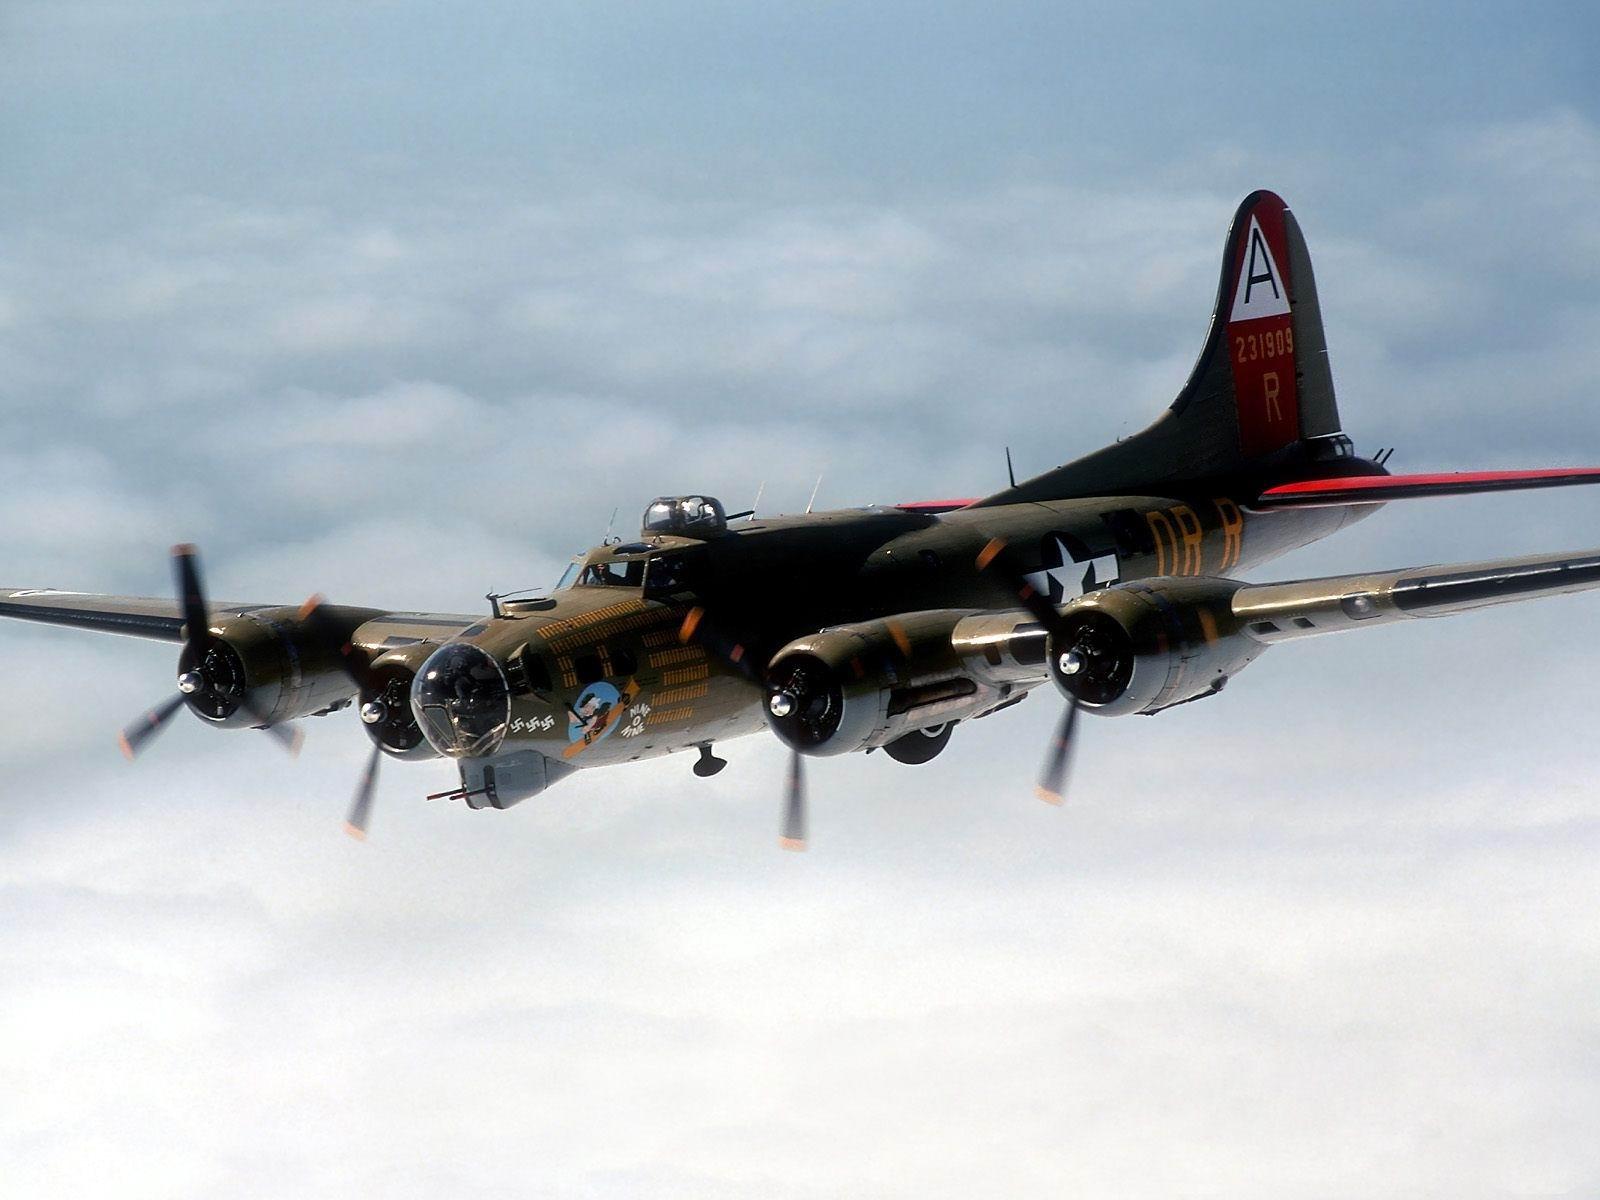 B 17 (航空機)の画像 p1_39